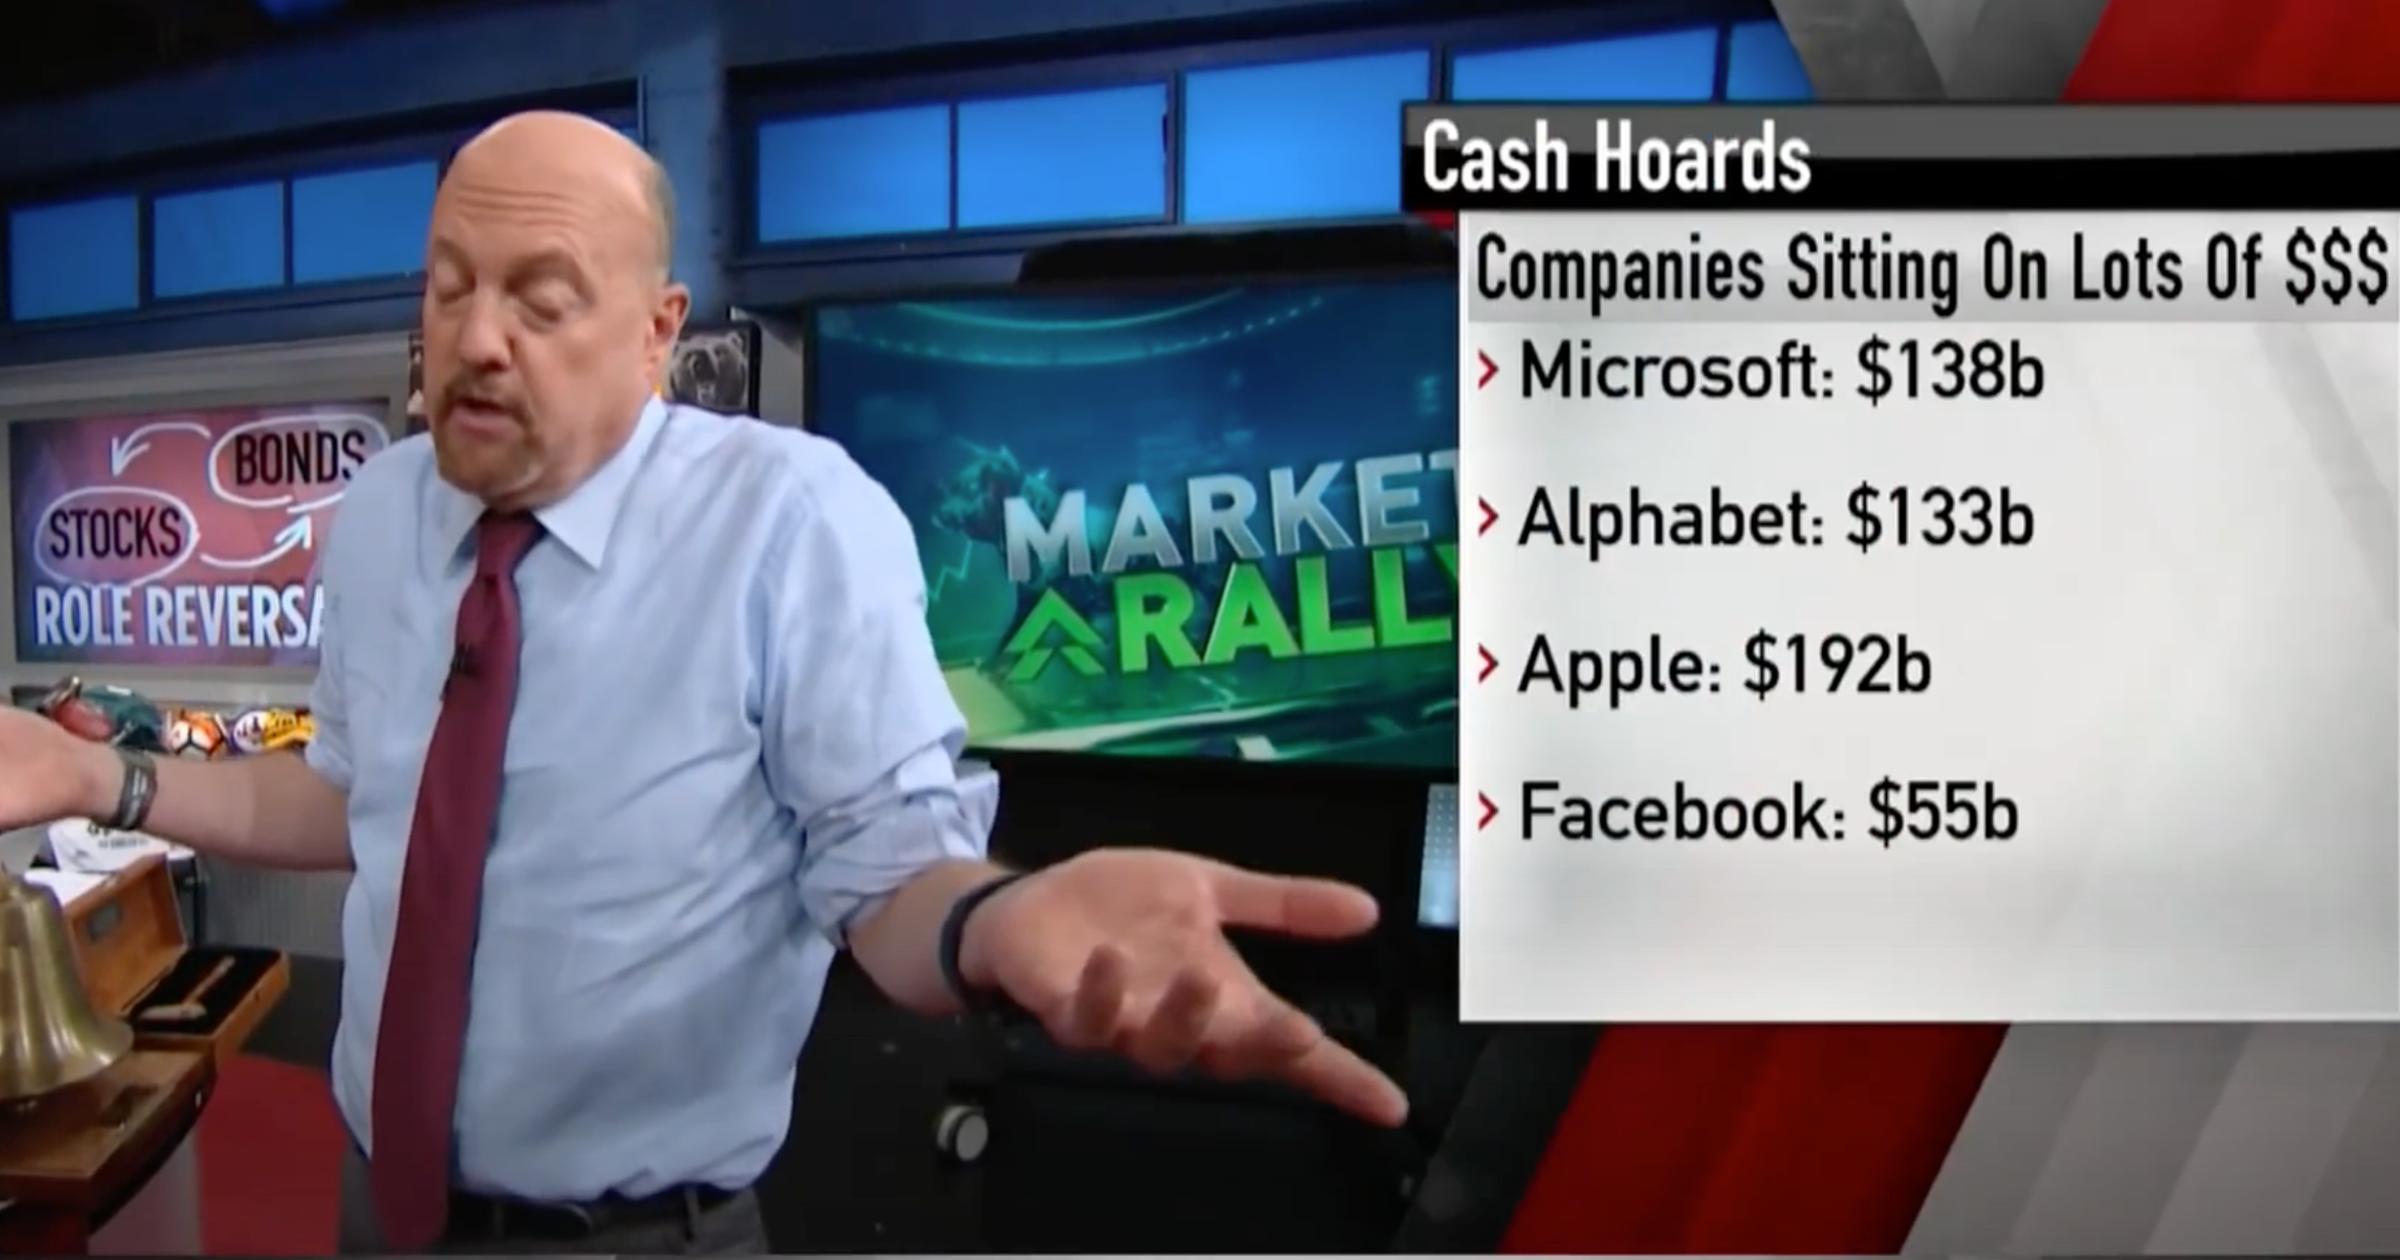 Jim Cramer Stocks Bonds